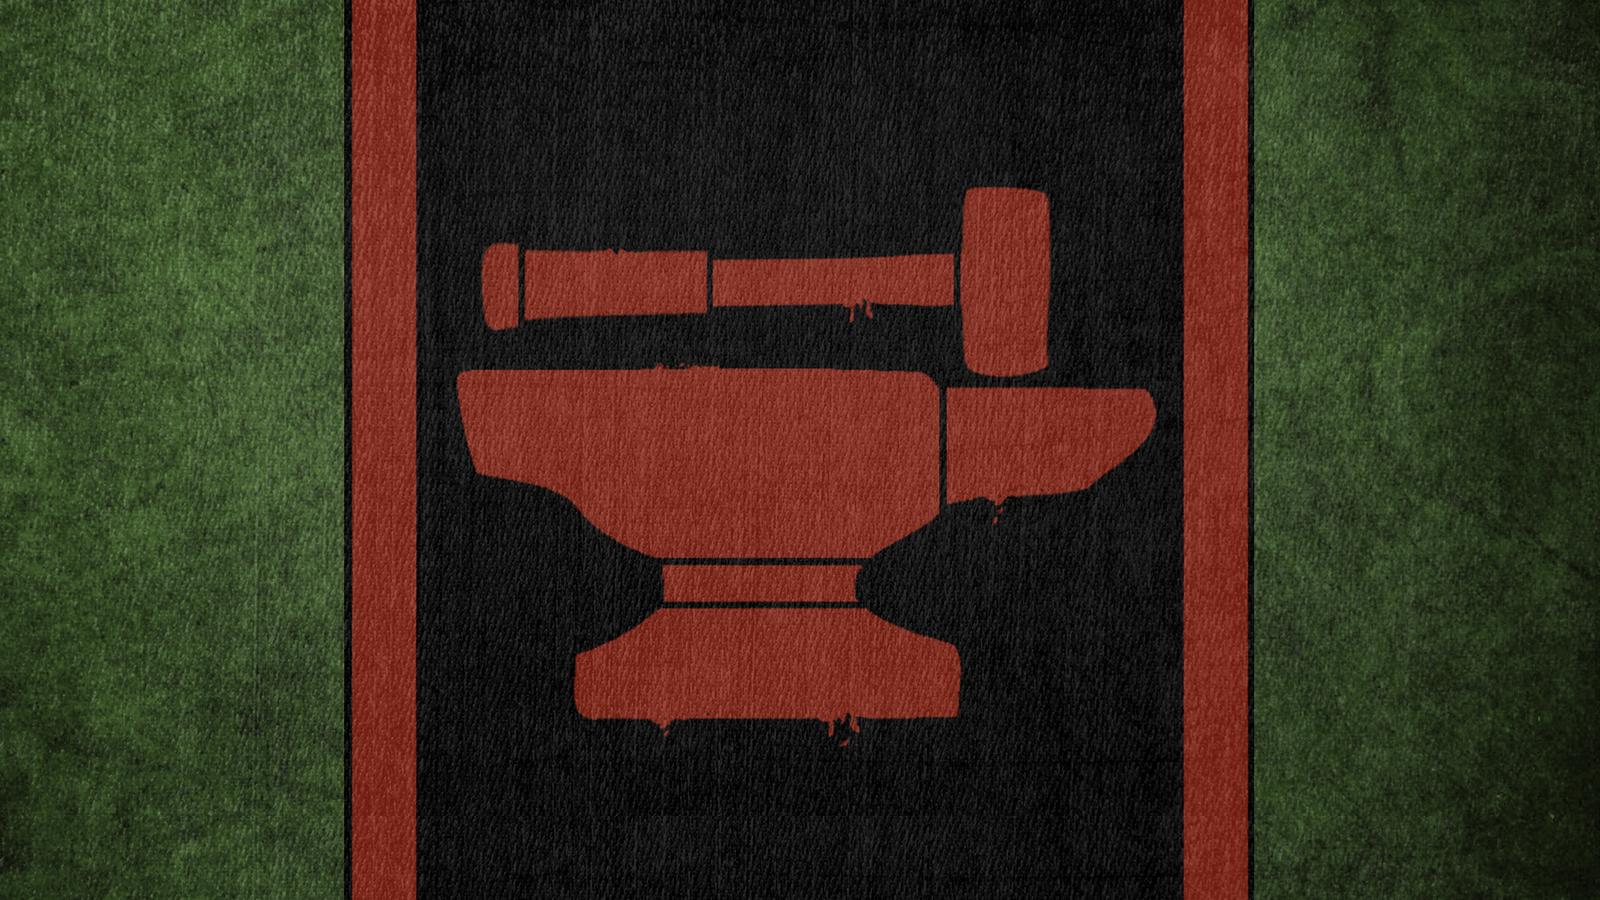 The Elder Scrolls: Flag of Orsinium by okiir